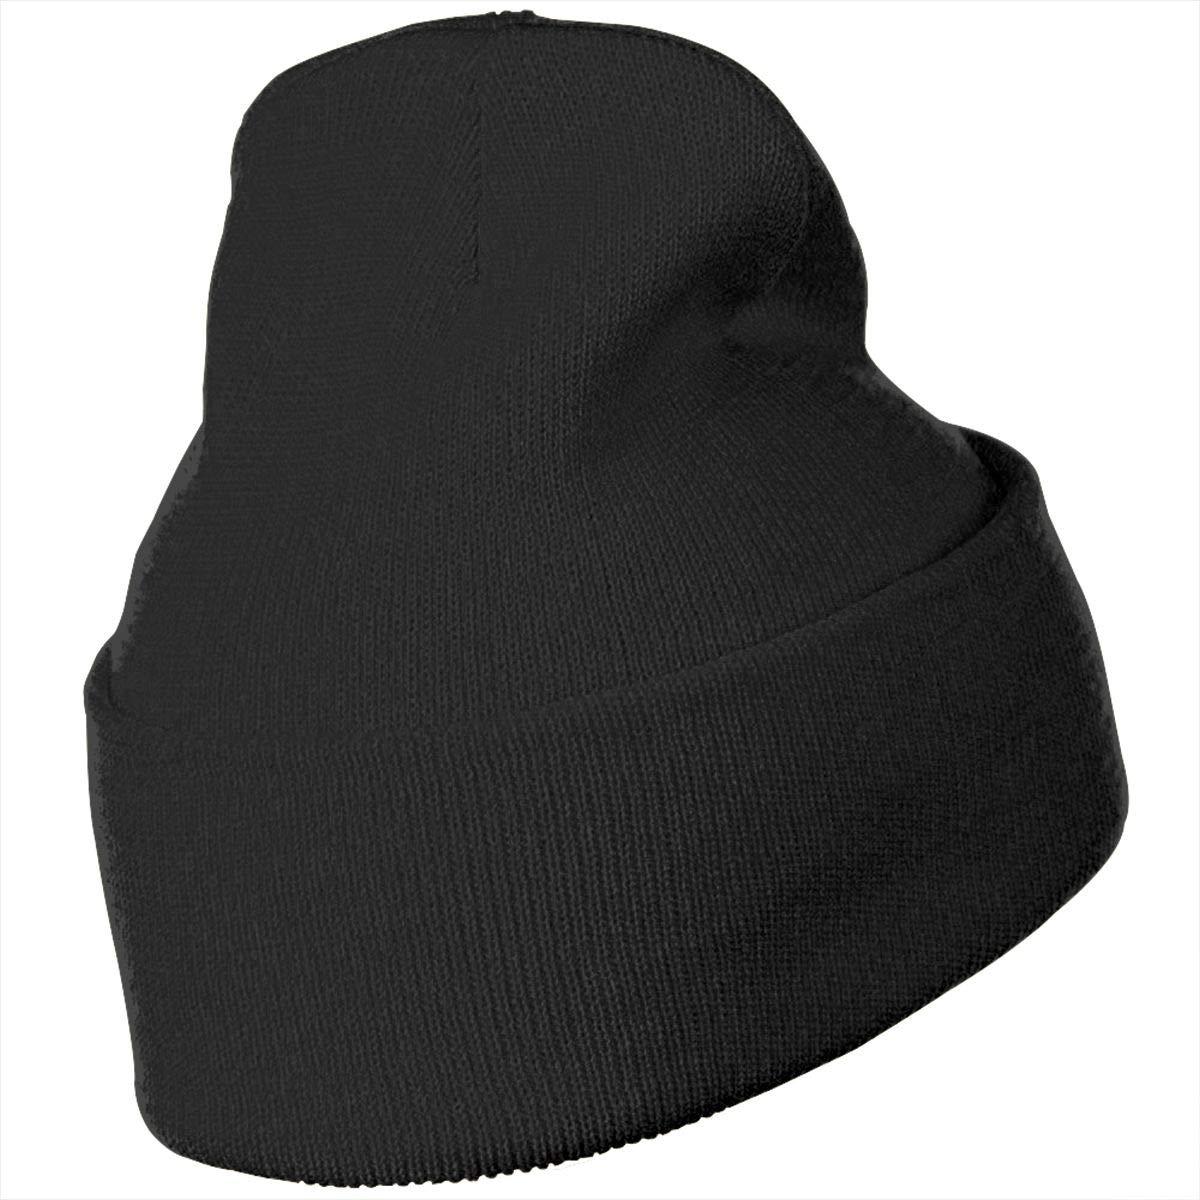 Yubb7E Dinosaur Warm Knit Winter Solid Beanie Hat Unisex Skull Cap